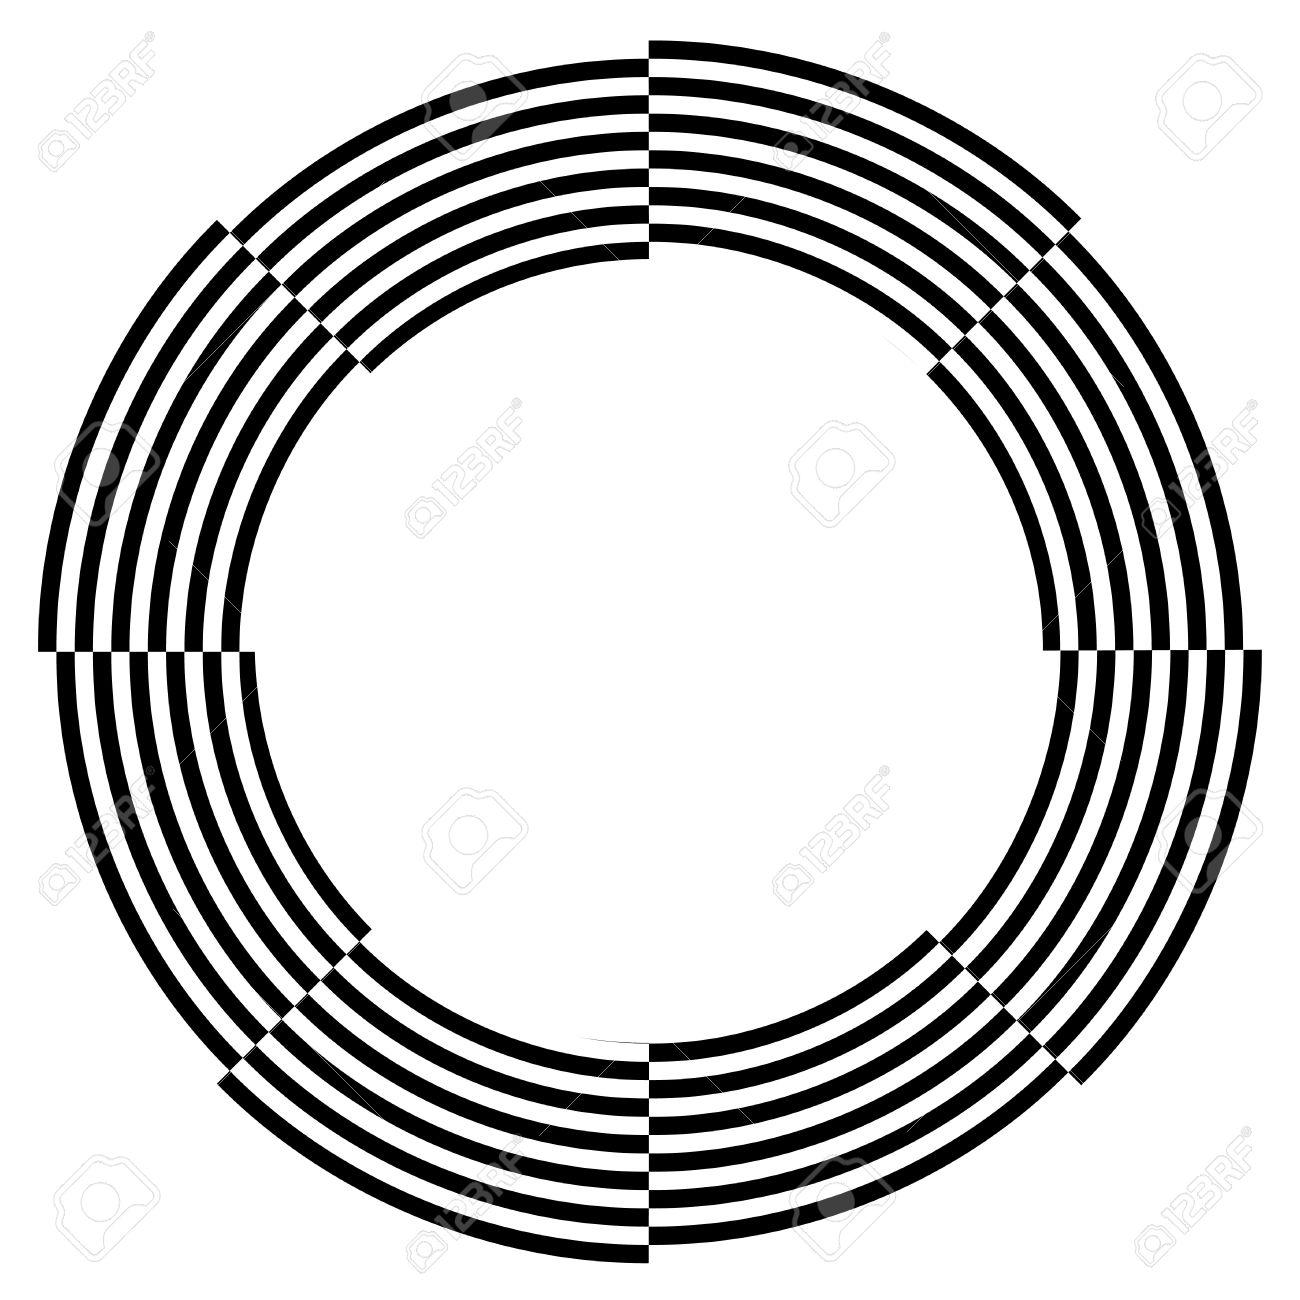 Spiral Frame, Illusion Border, Broken Pattern Design, Copy Space ...